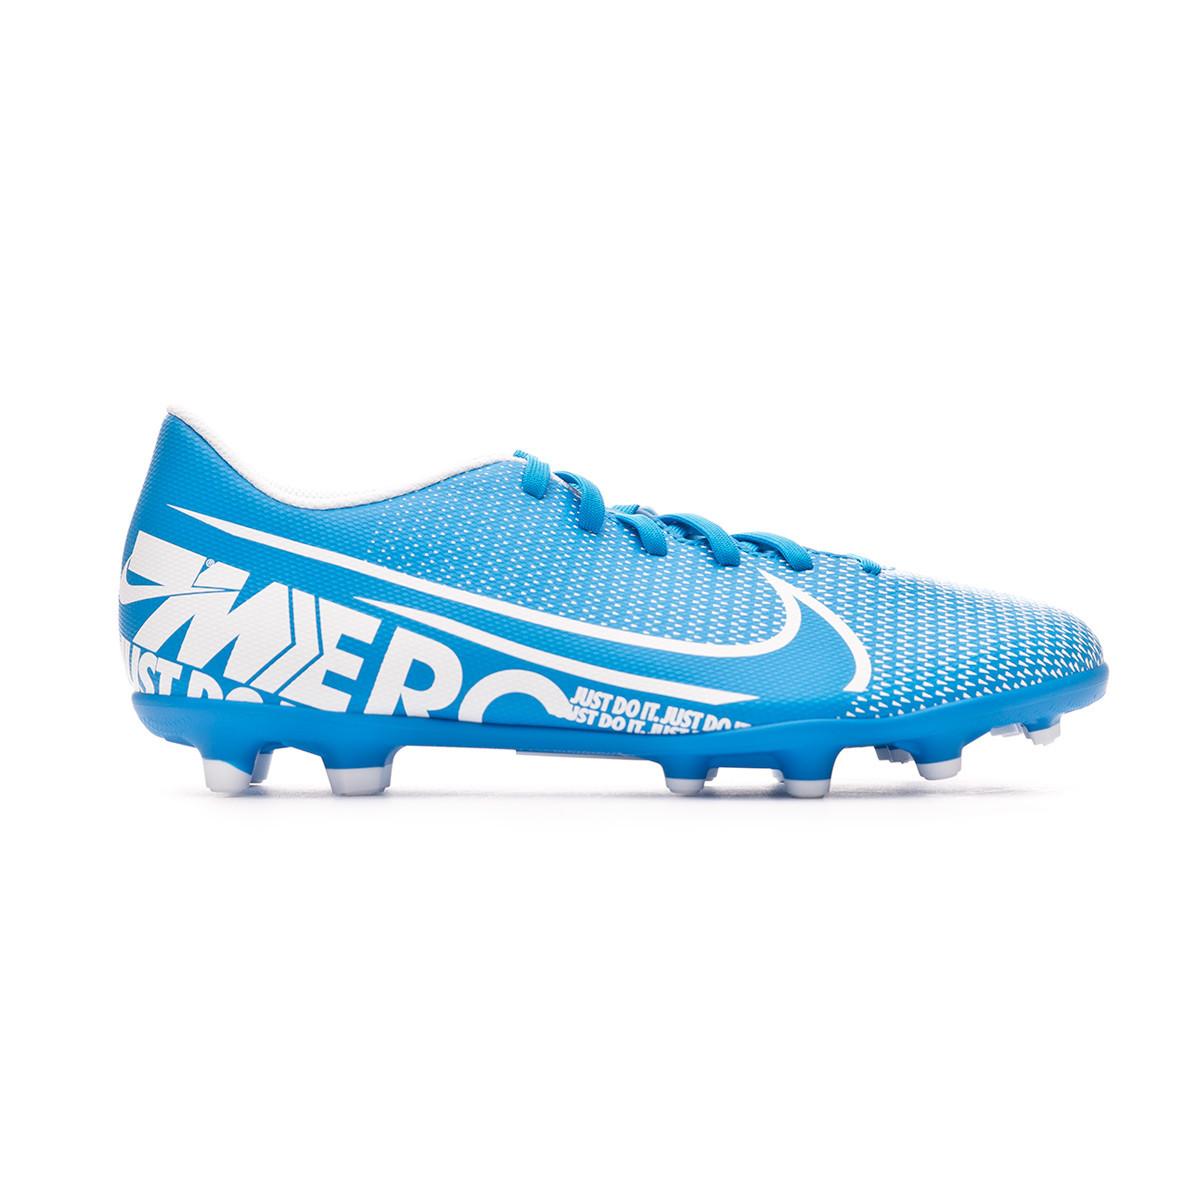 Buscar ensayo lo mismo  Football Boots Nike Mercurial Vapor XIII Club FG/MG Blue  hero-White-Obsidian - Football store Fútbol Emotion